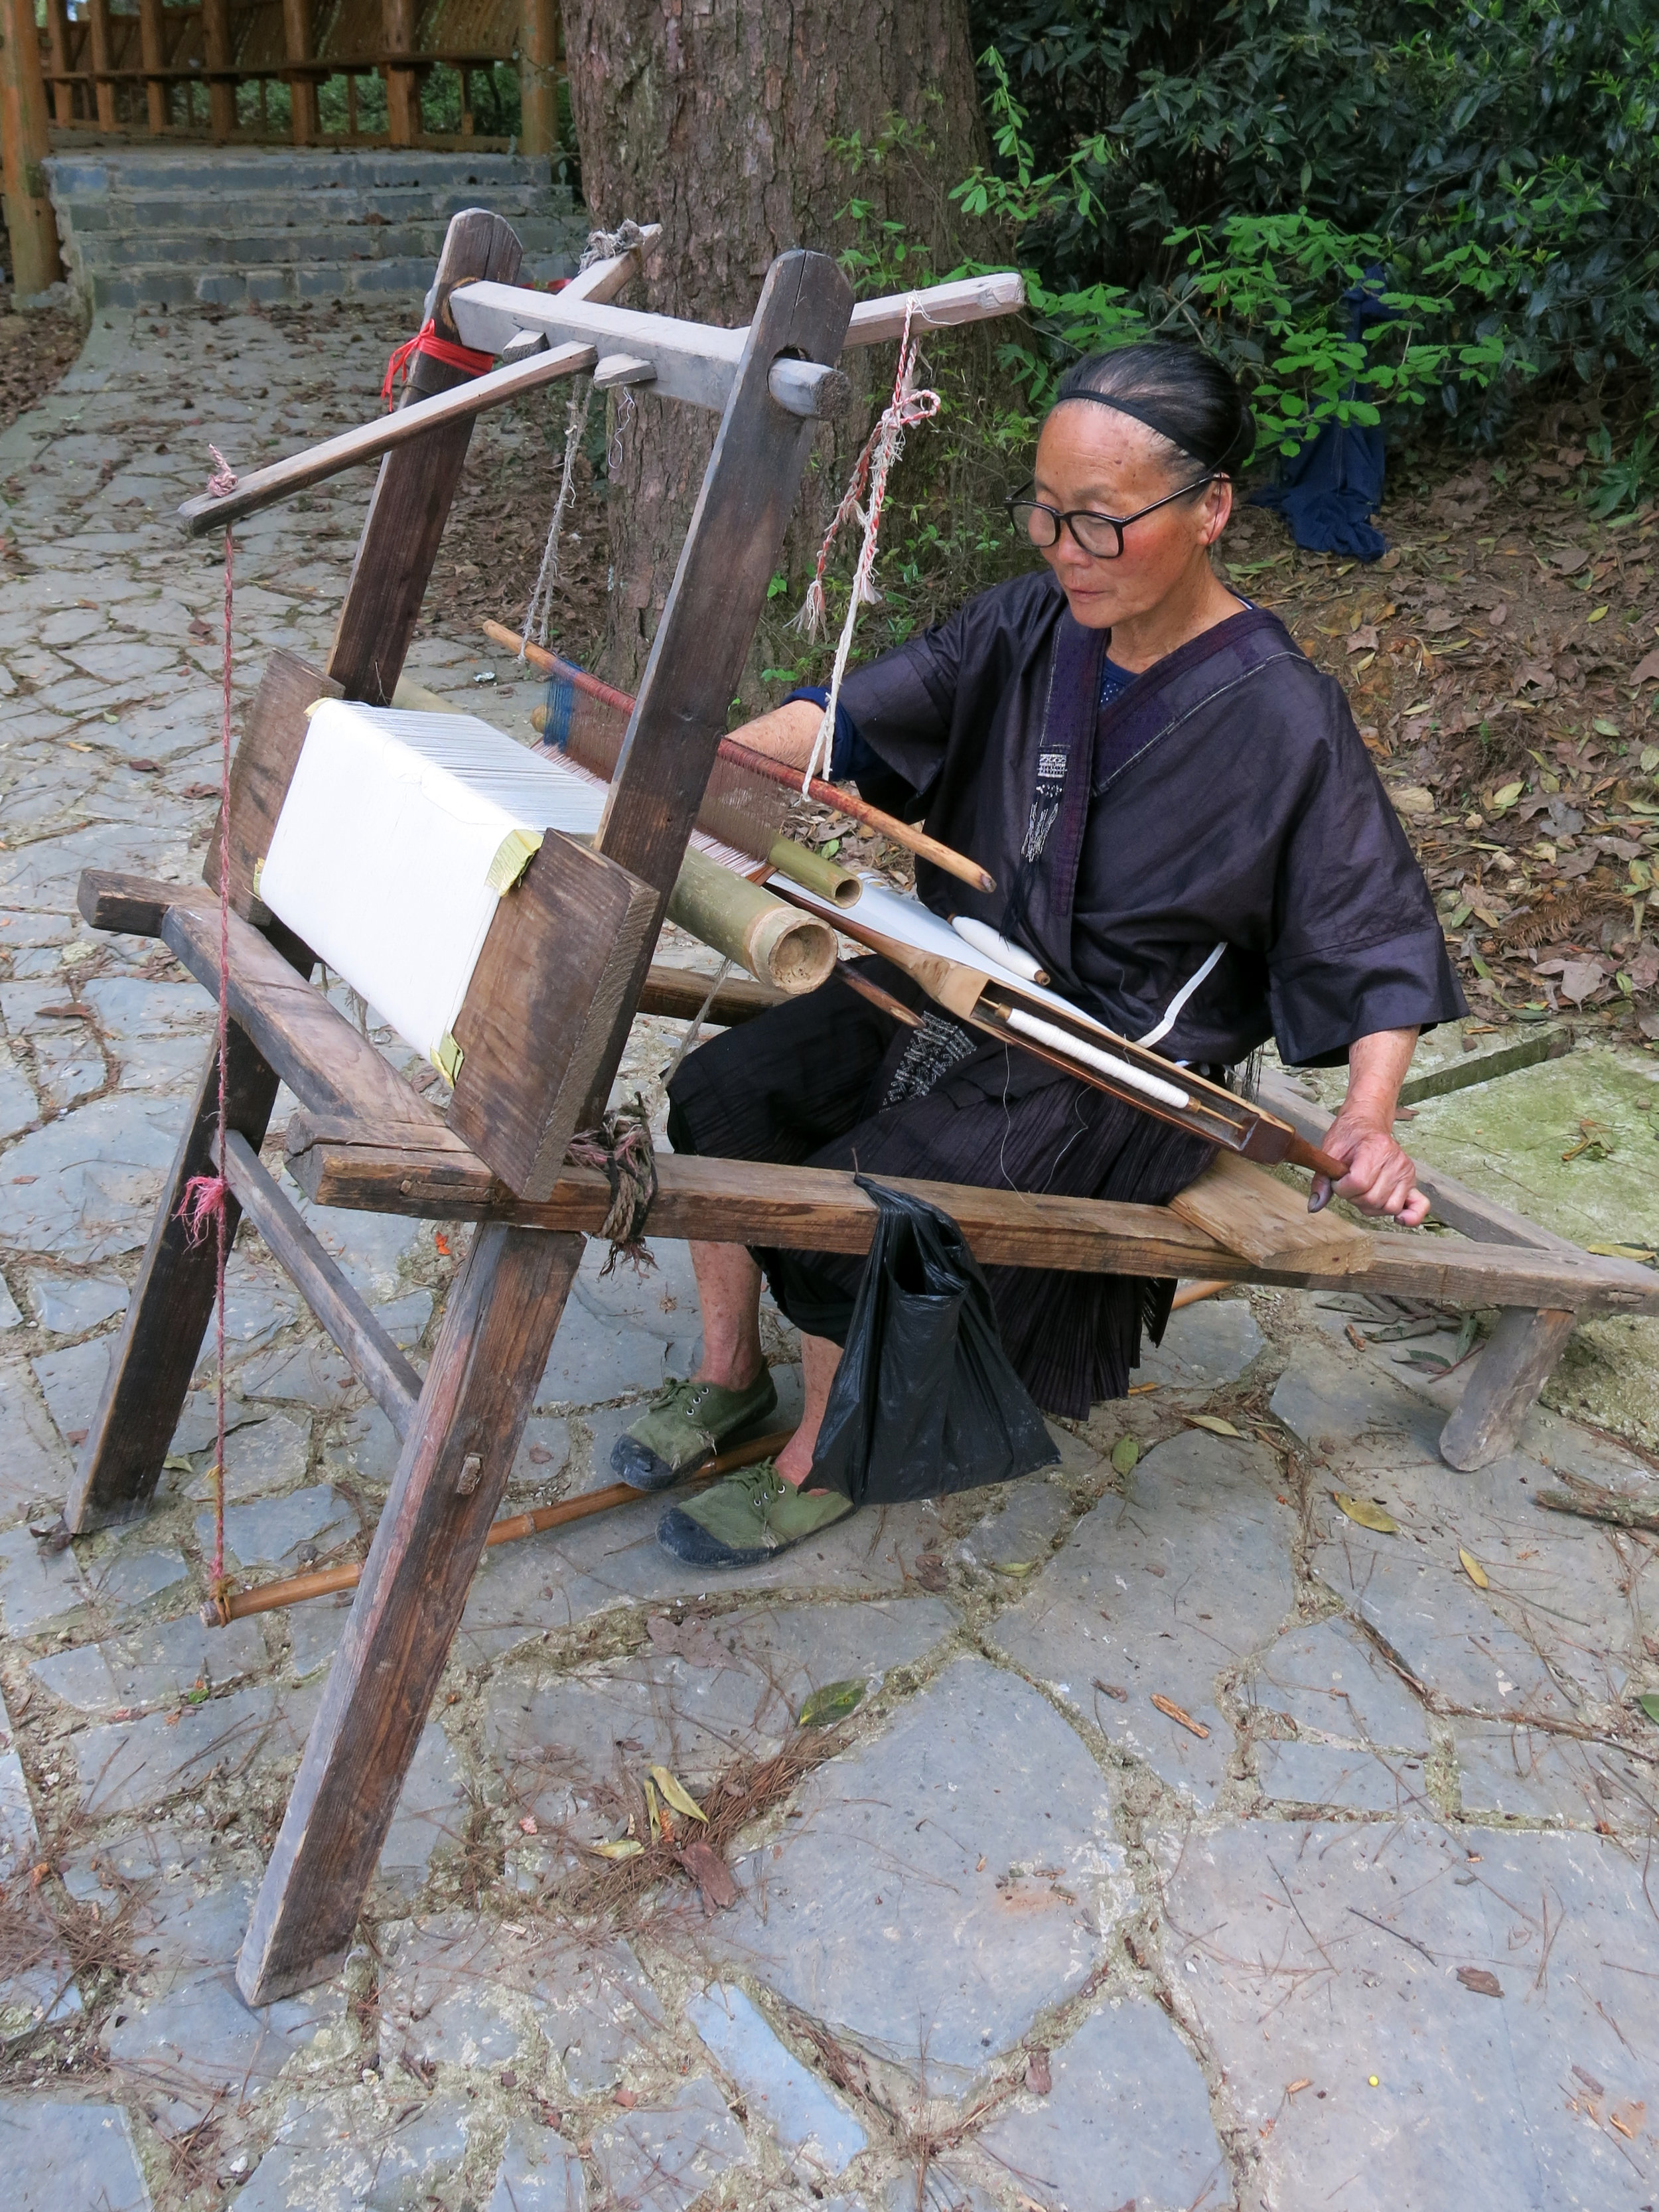 miao-tin-gimp-embroidery-in-zhanliu-china25